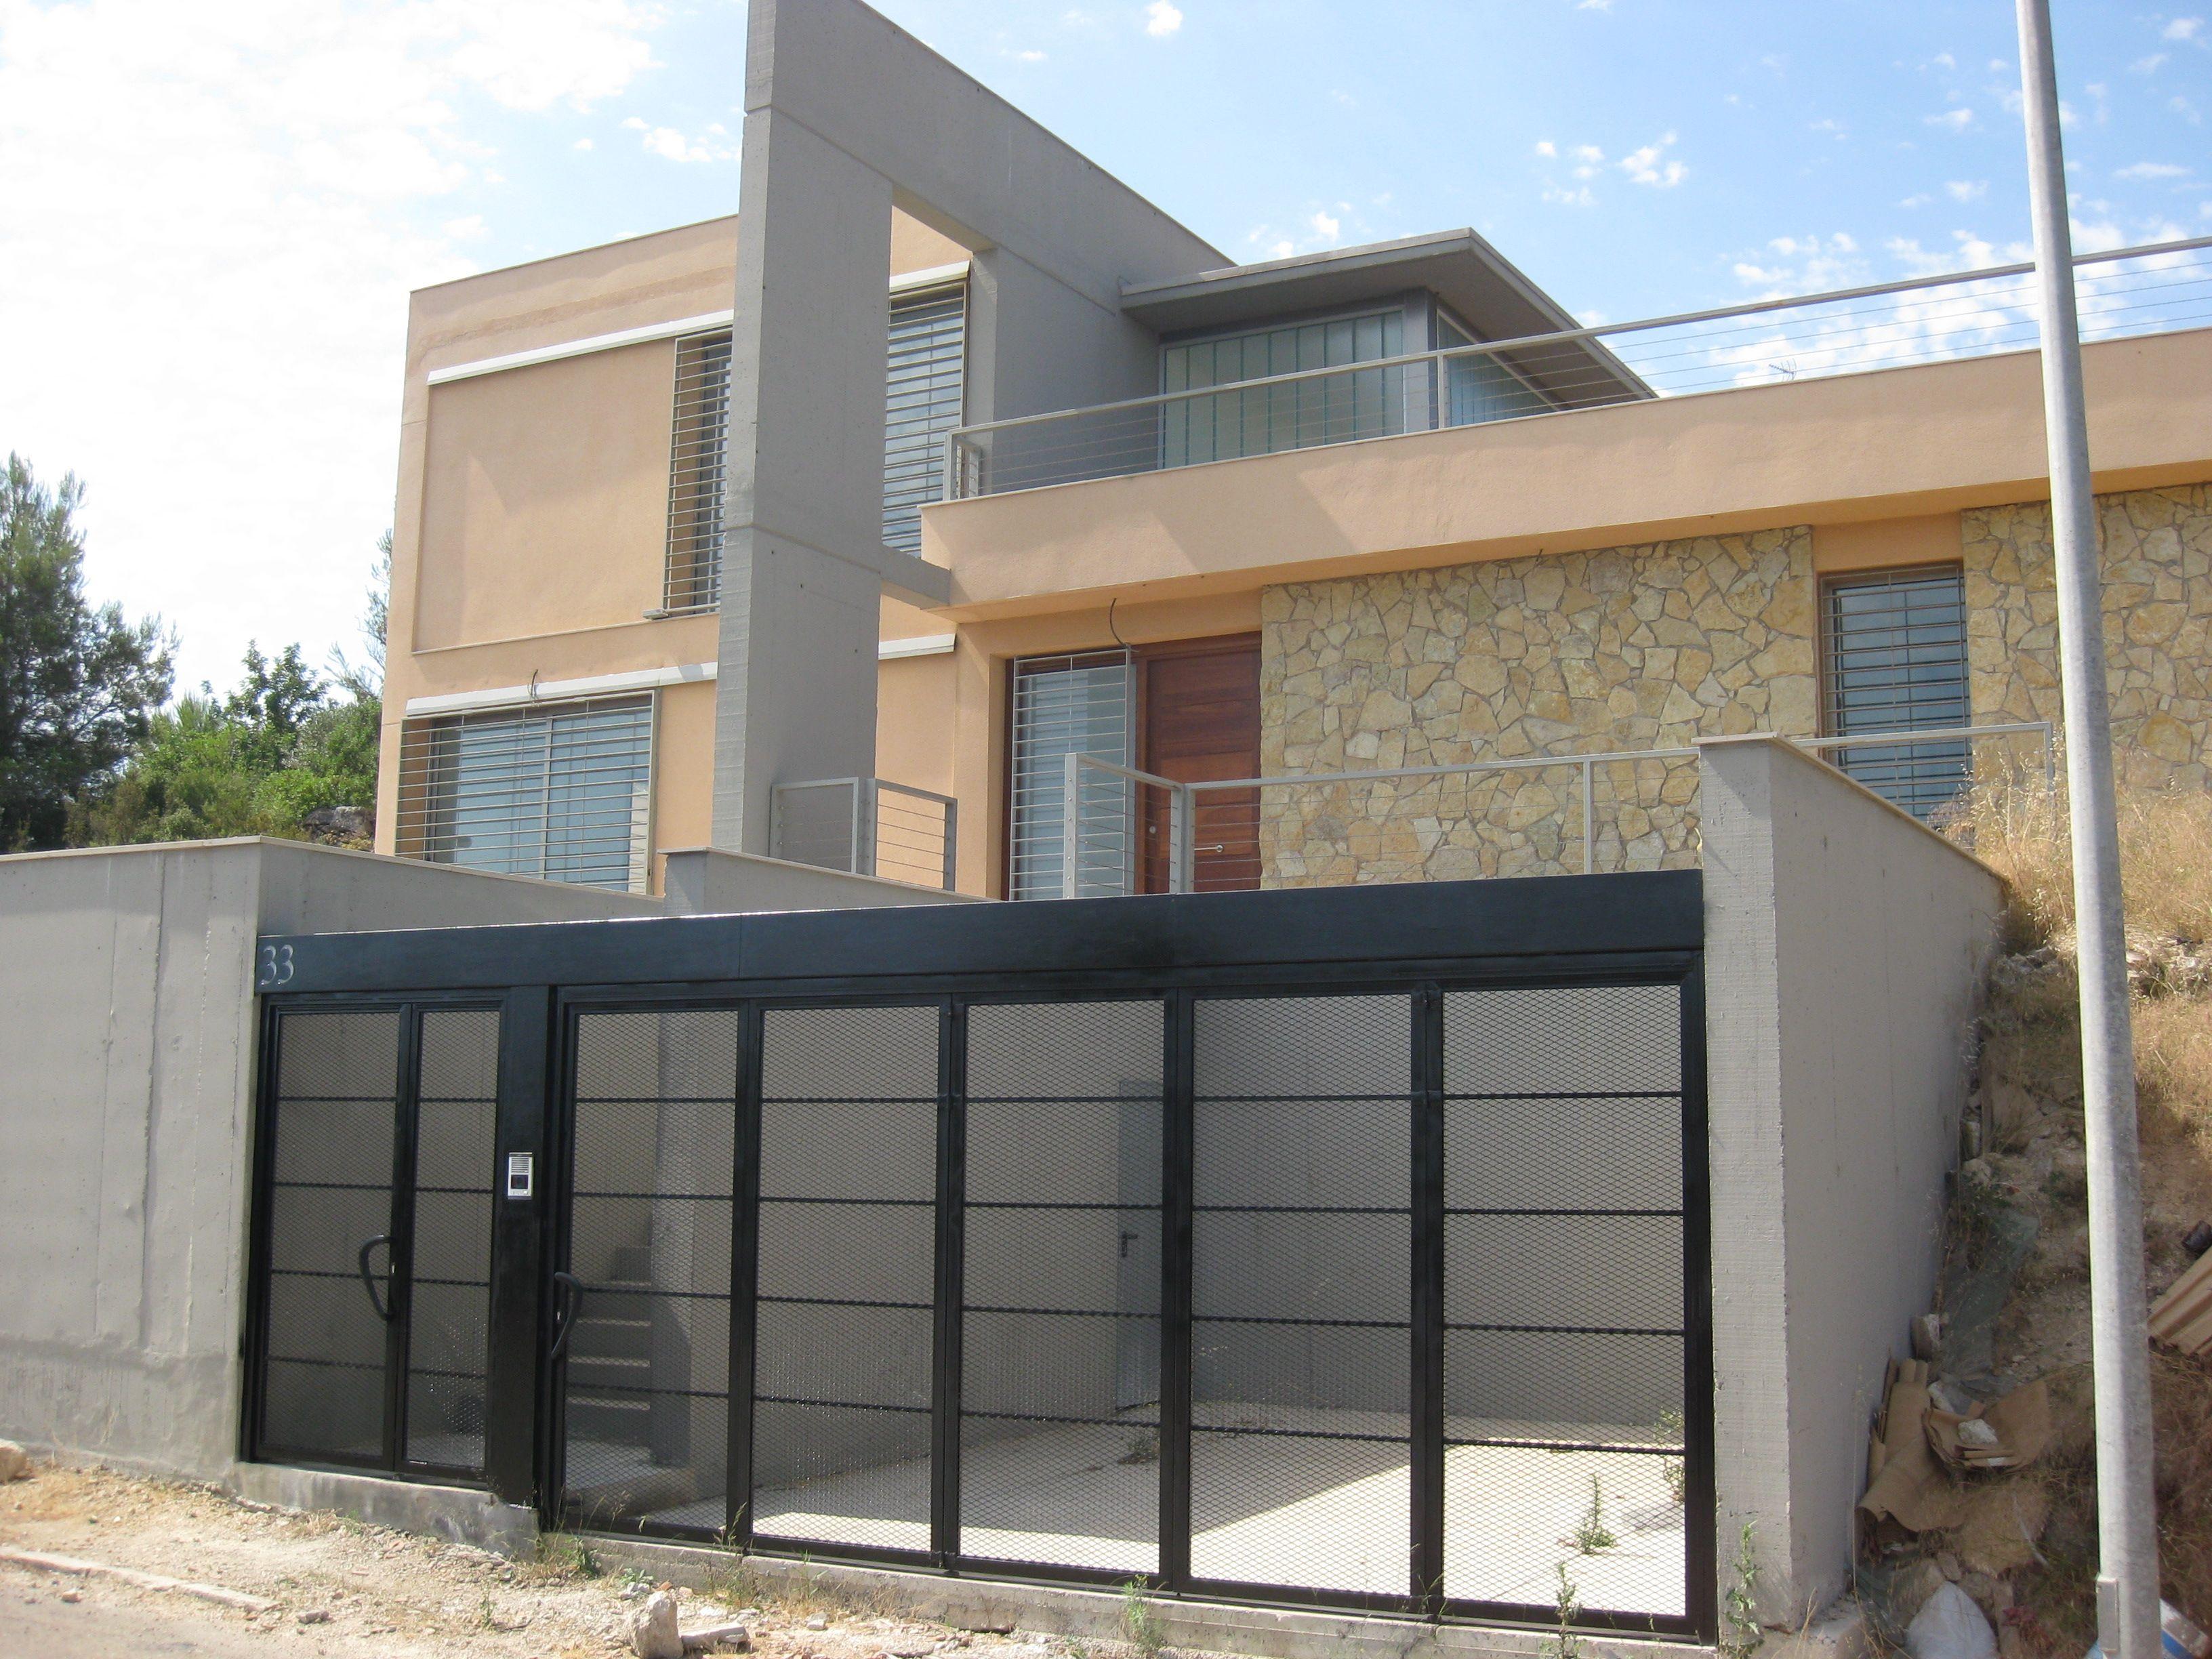 Casas moderno exterior garaje puertas fachada for Loft modernos exterior